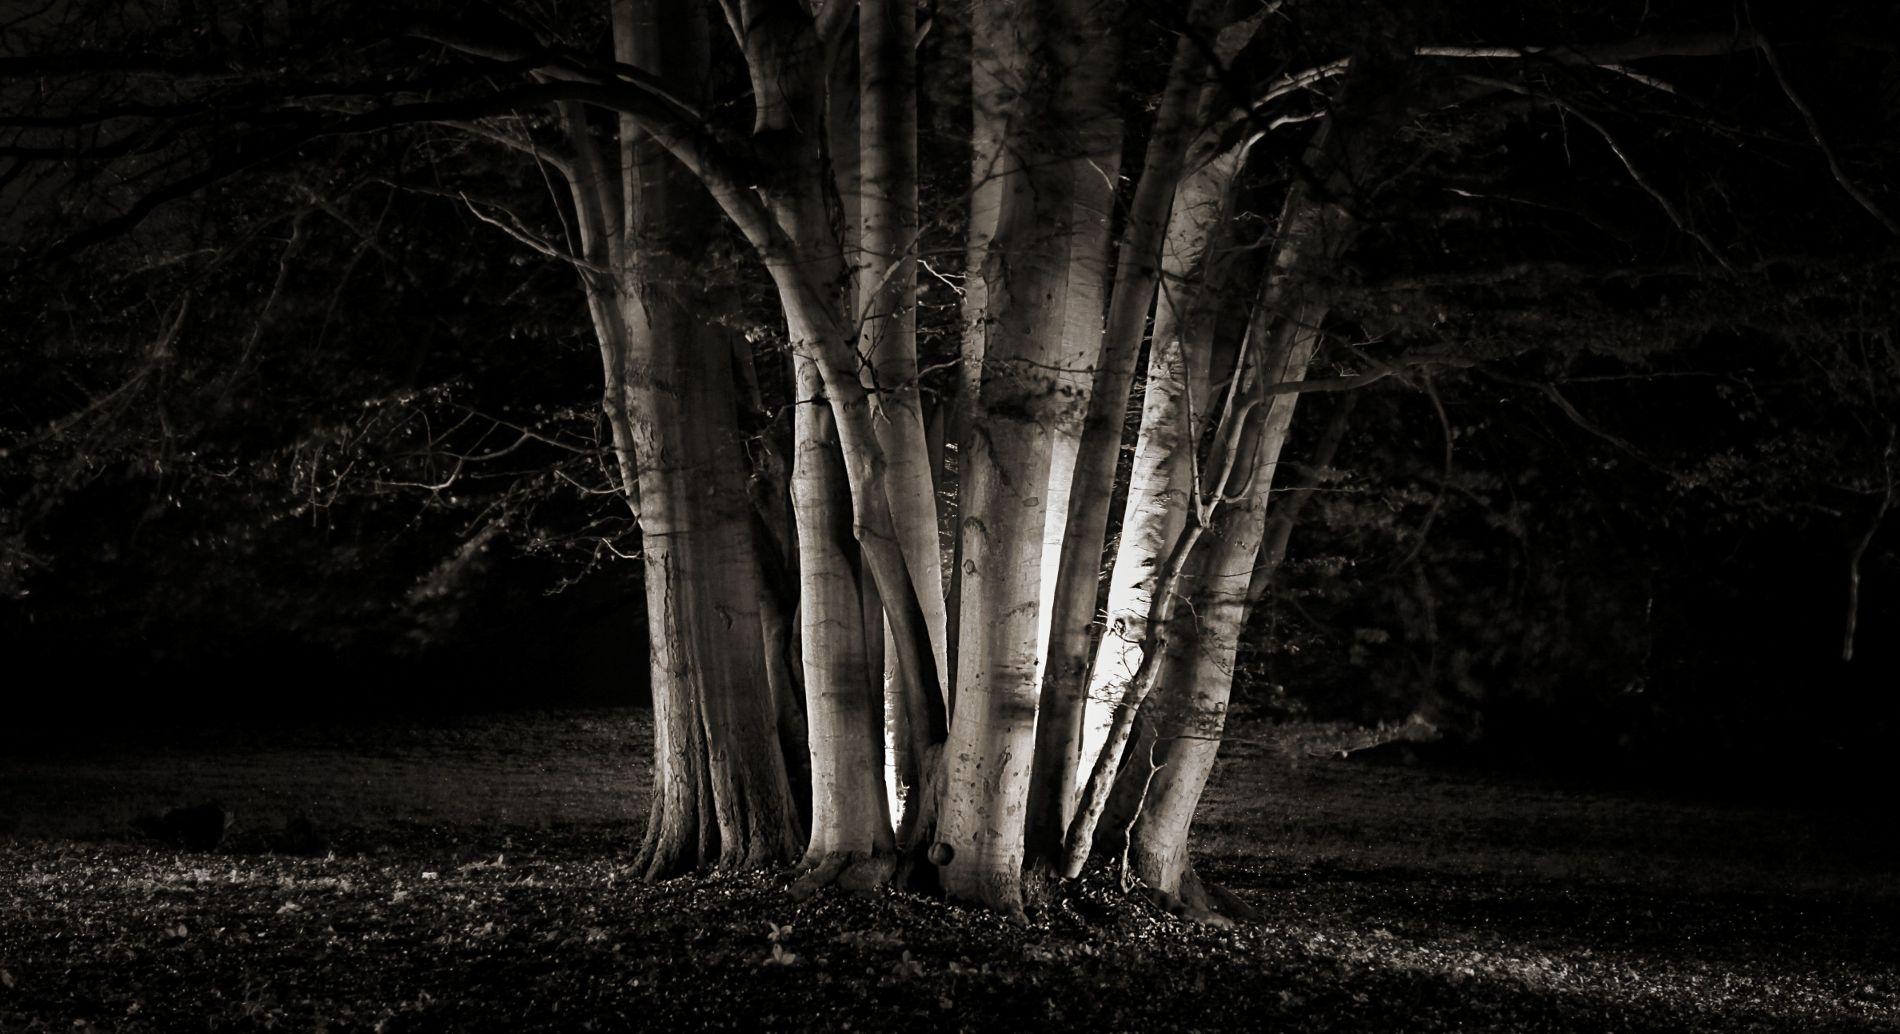 fotokurs th ringen nachtfotografie alte b ume lichtmalerei naturfotografie. Black Bedroom Furniture Sets. Home Design Ideas